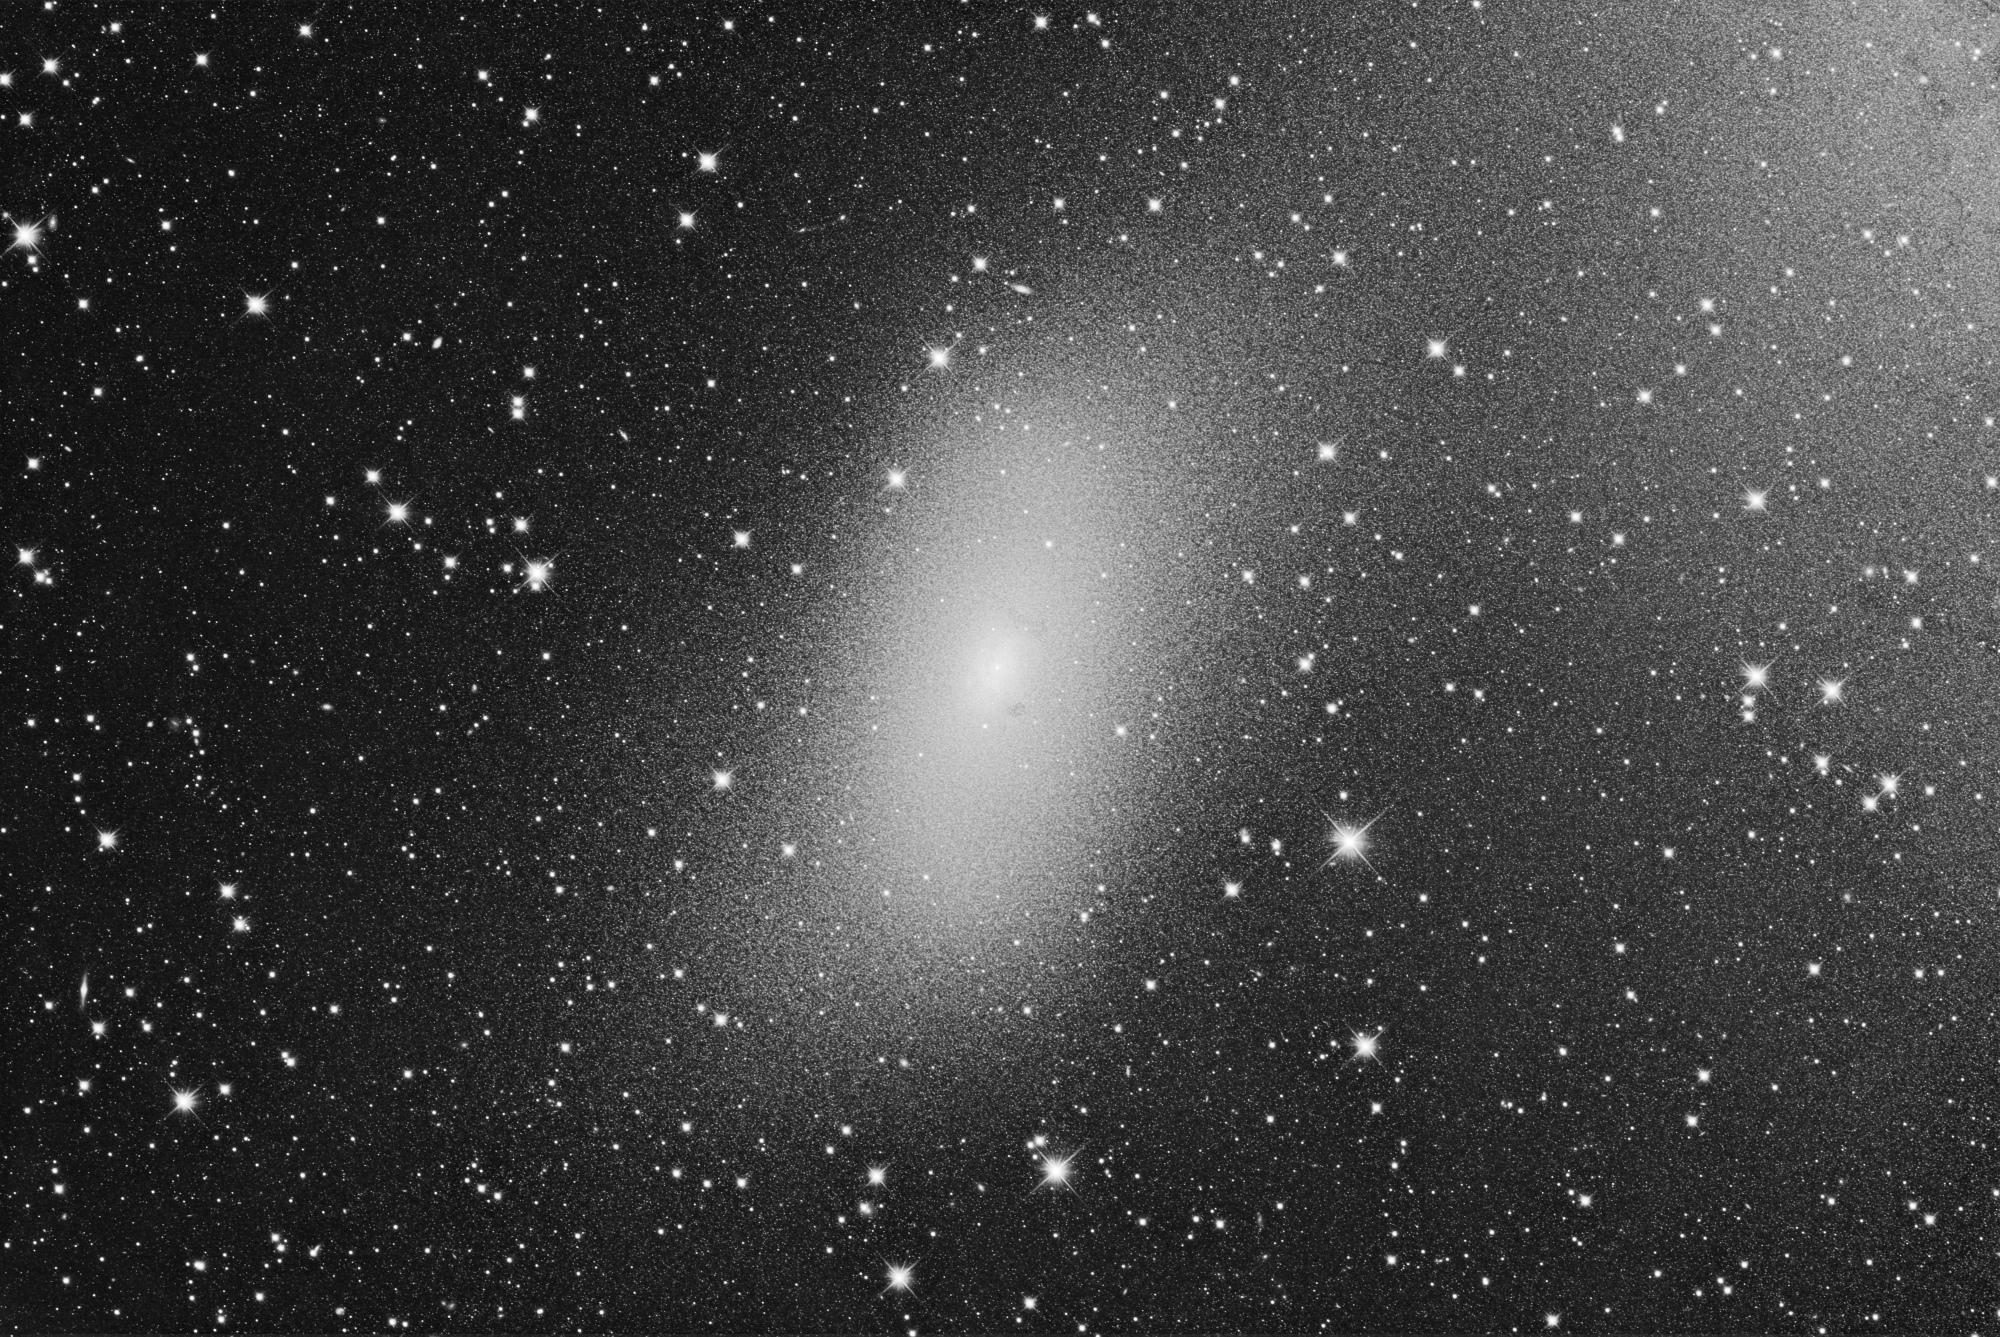 NGC-205-pour-serge-finale-6000-NB.jpg